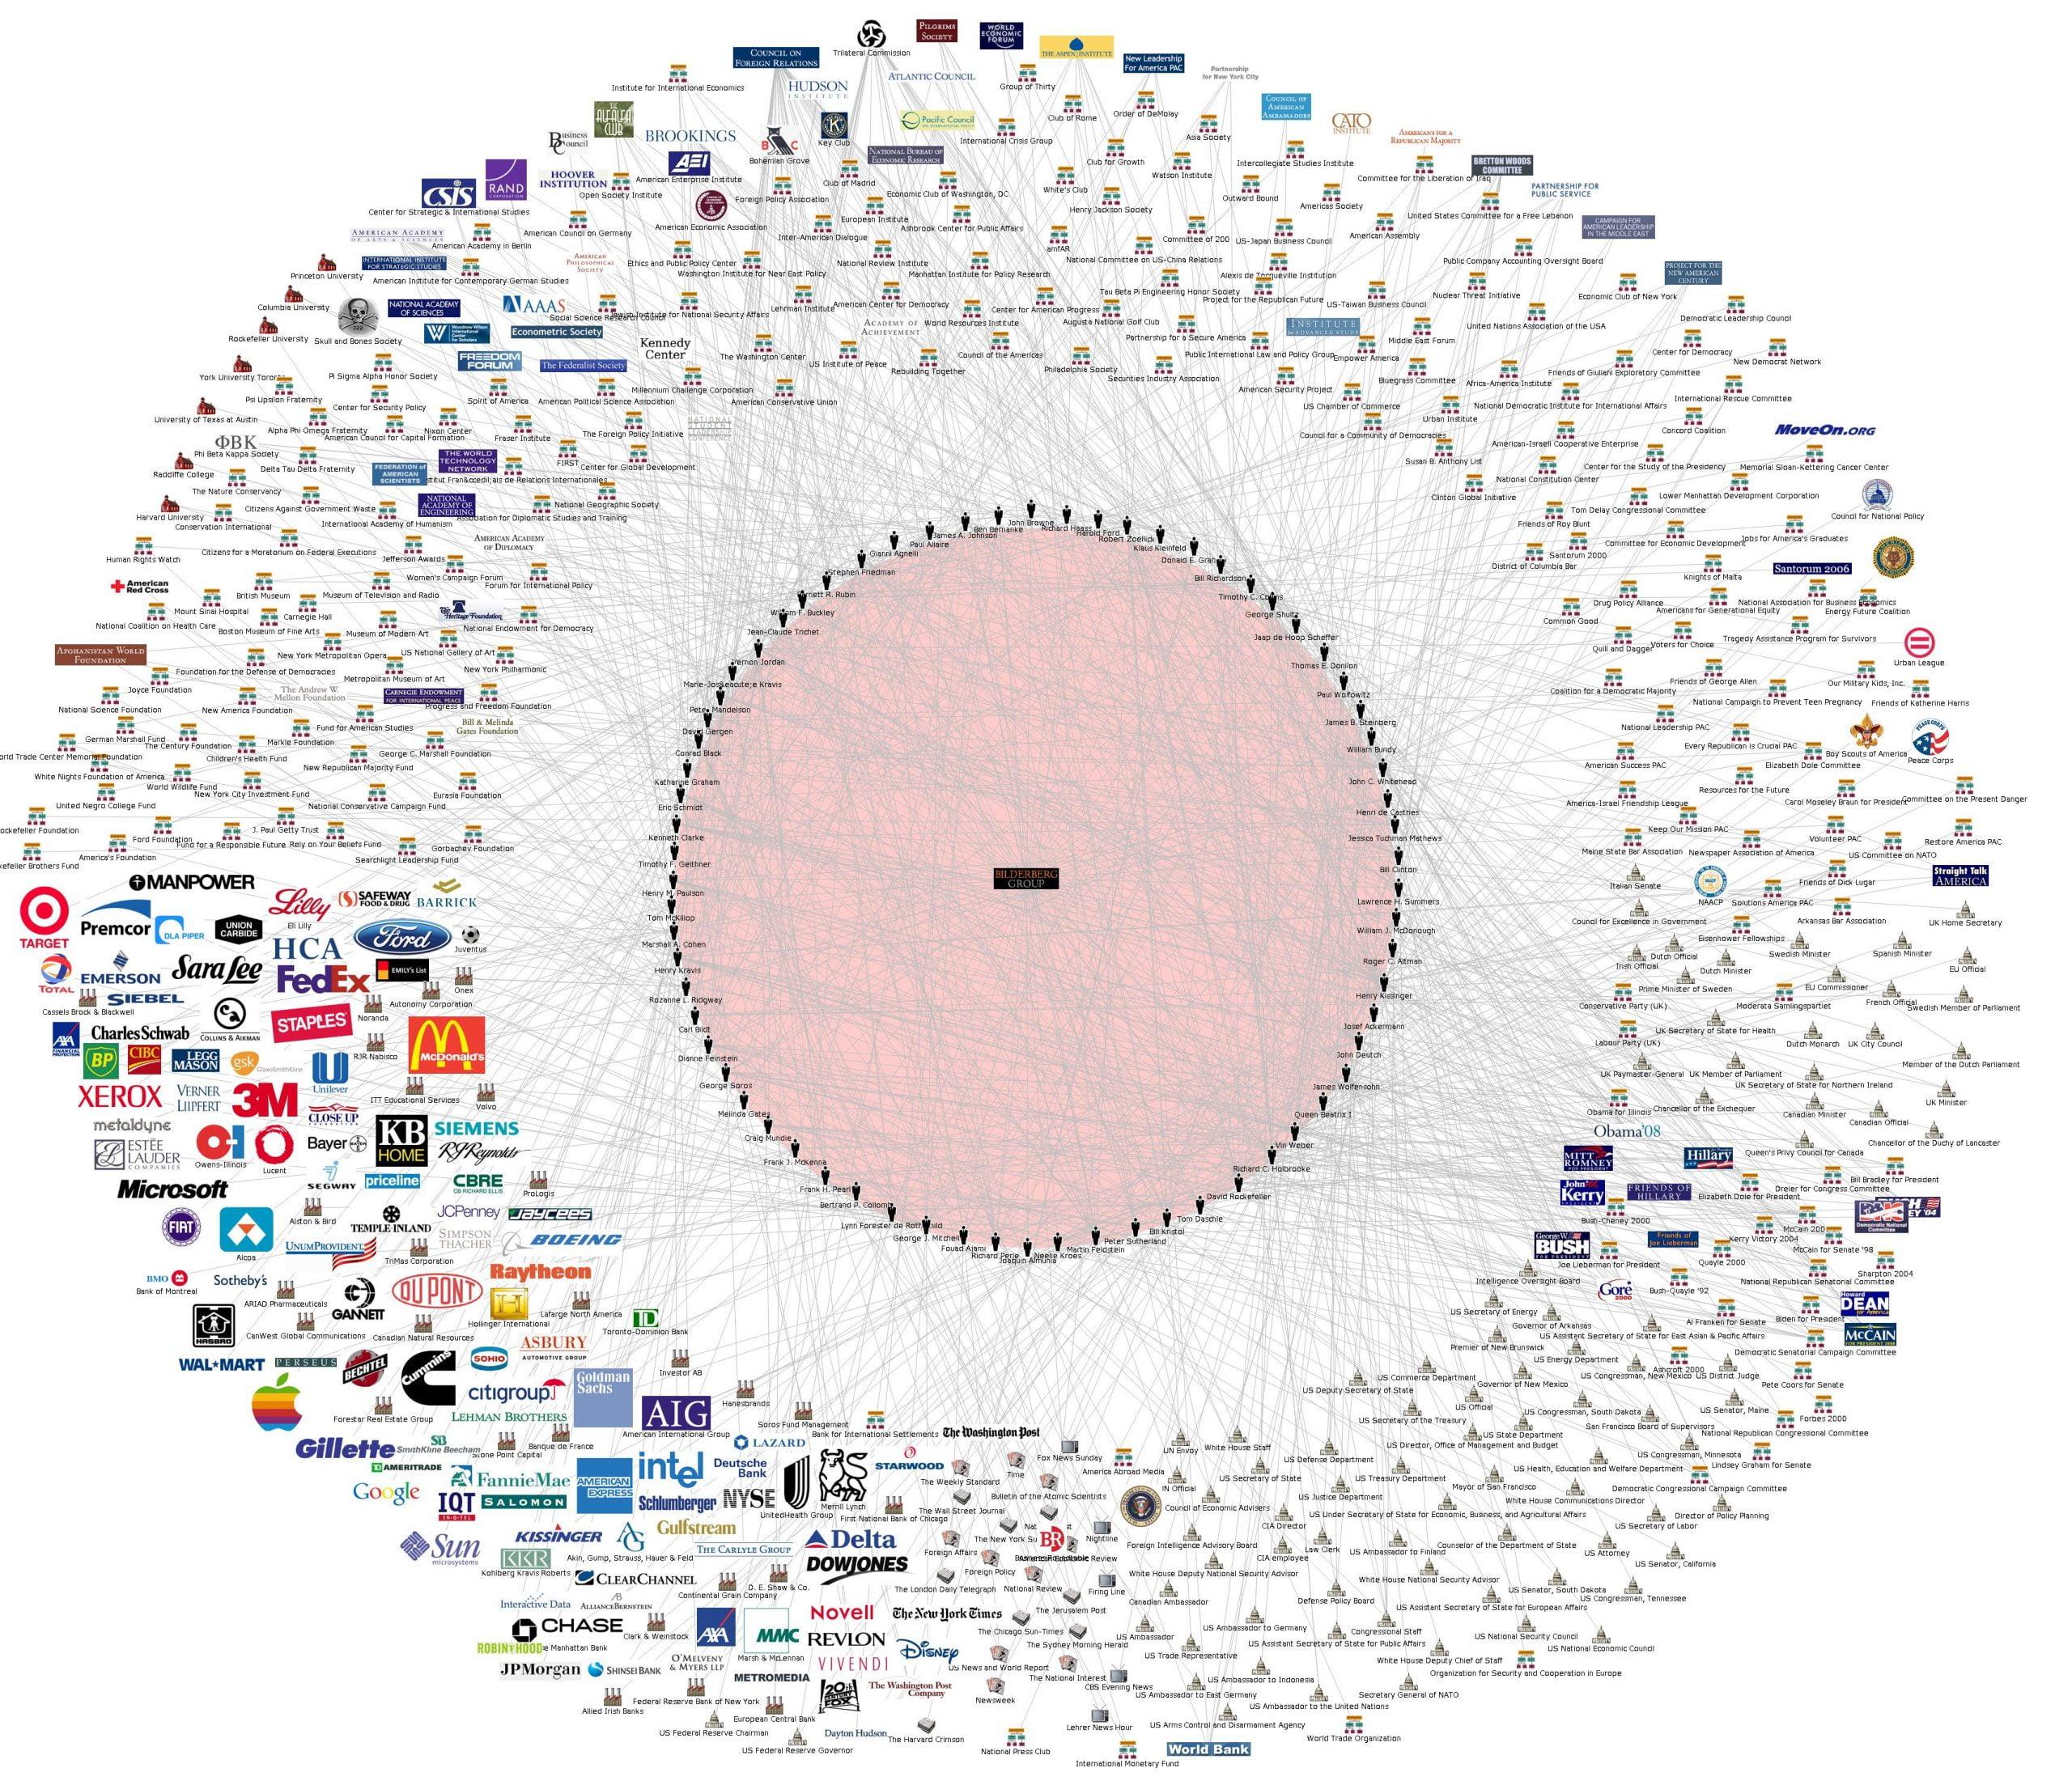 Mainstream Terror, High Impact Trading Events & Manipulation